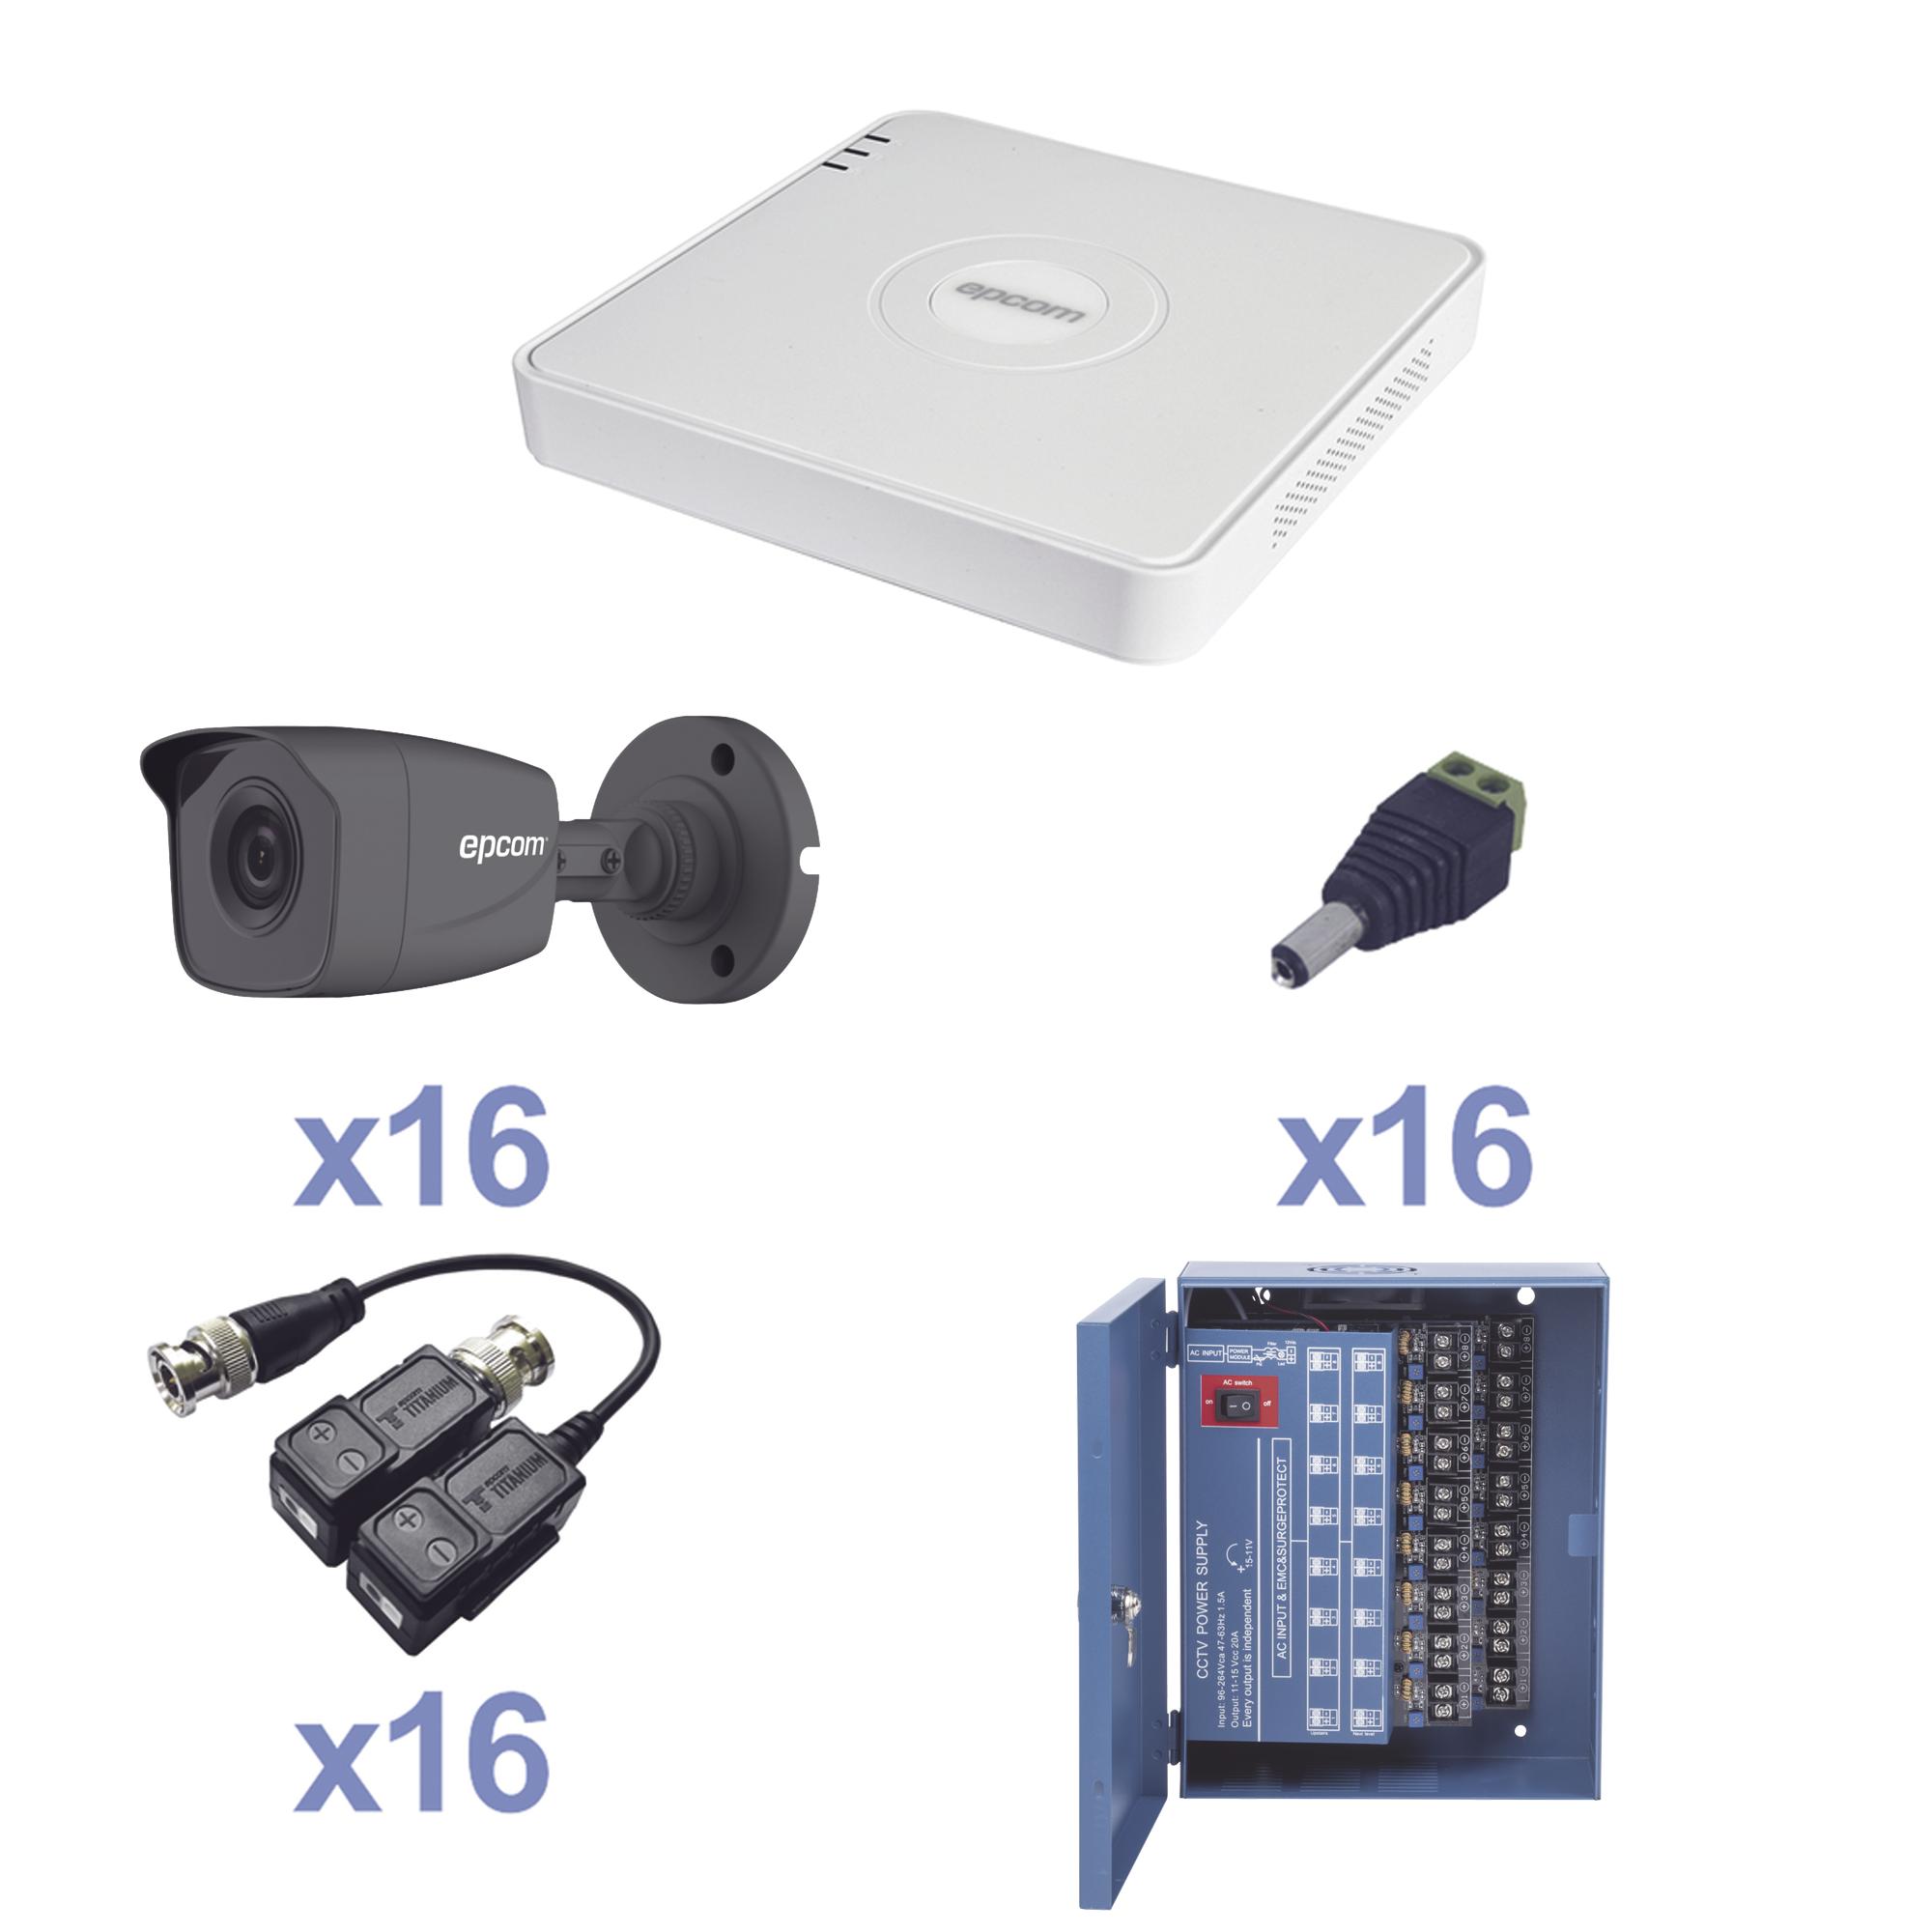 KIT TurboHD 720p / Incluye DVR 16 Ch / 16 cámaras balas (interior - exterior 3.6 mm) / Transceptores / Conectores / Fuente de poder profesional